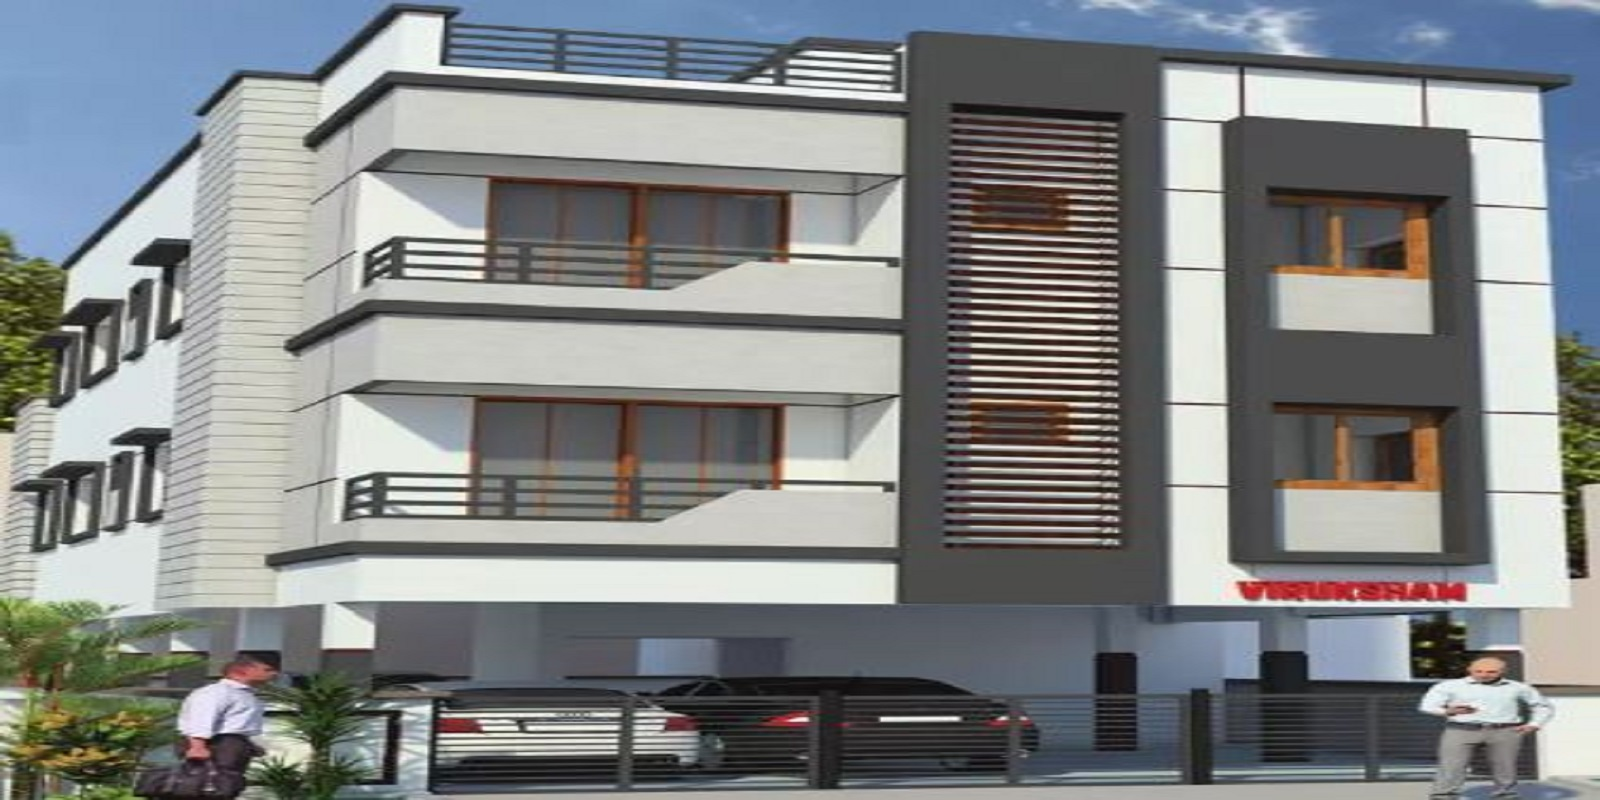 naven viruksham project large image2